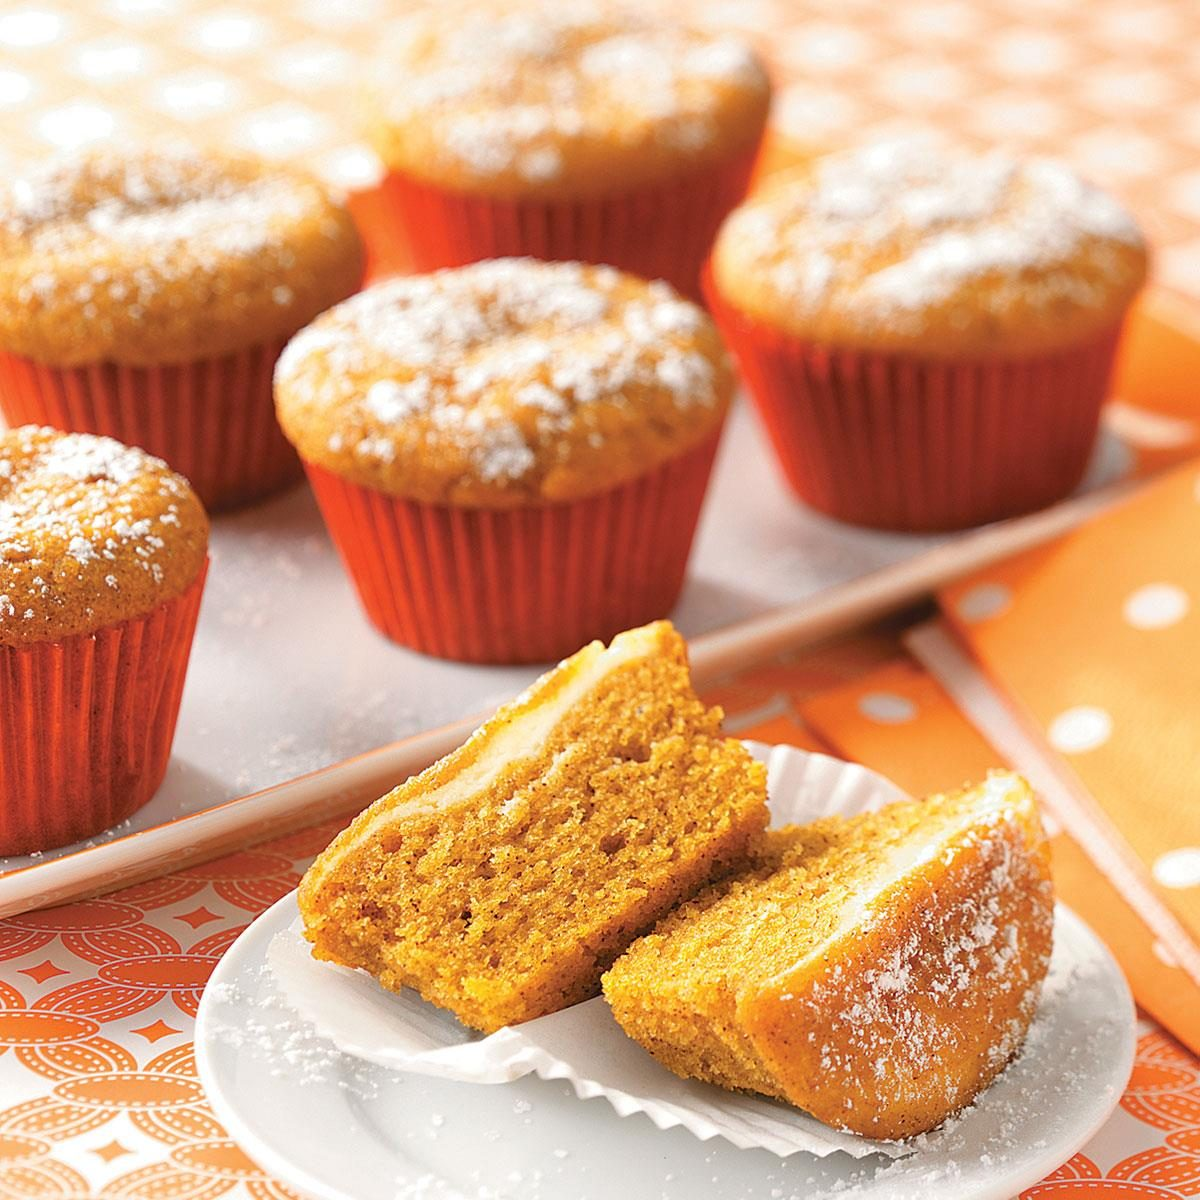 Pumpkin Cupcakes Surprise Pumpkin Cupcakes Recipe  Taste Of Home